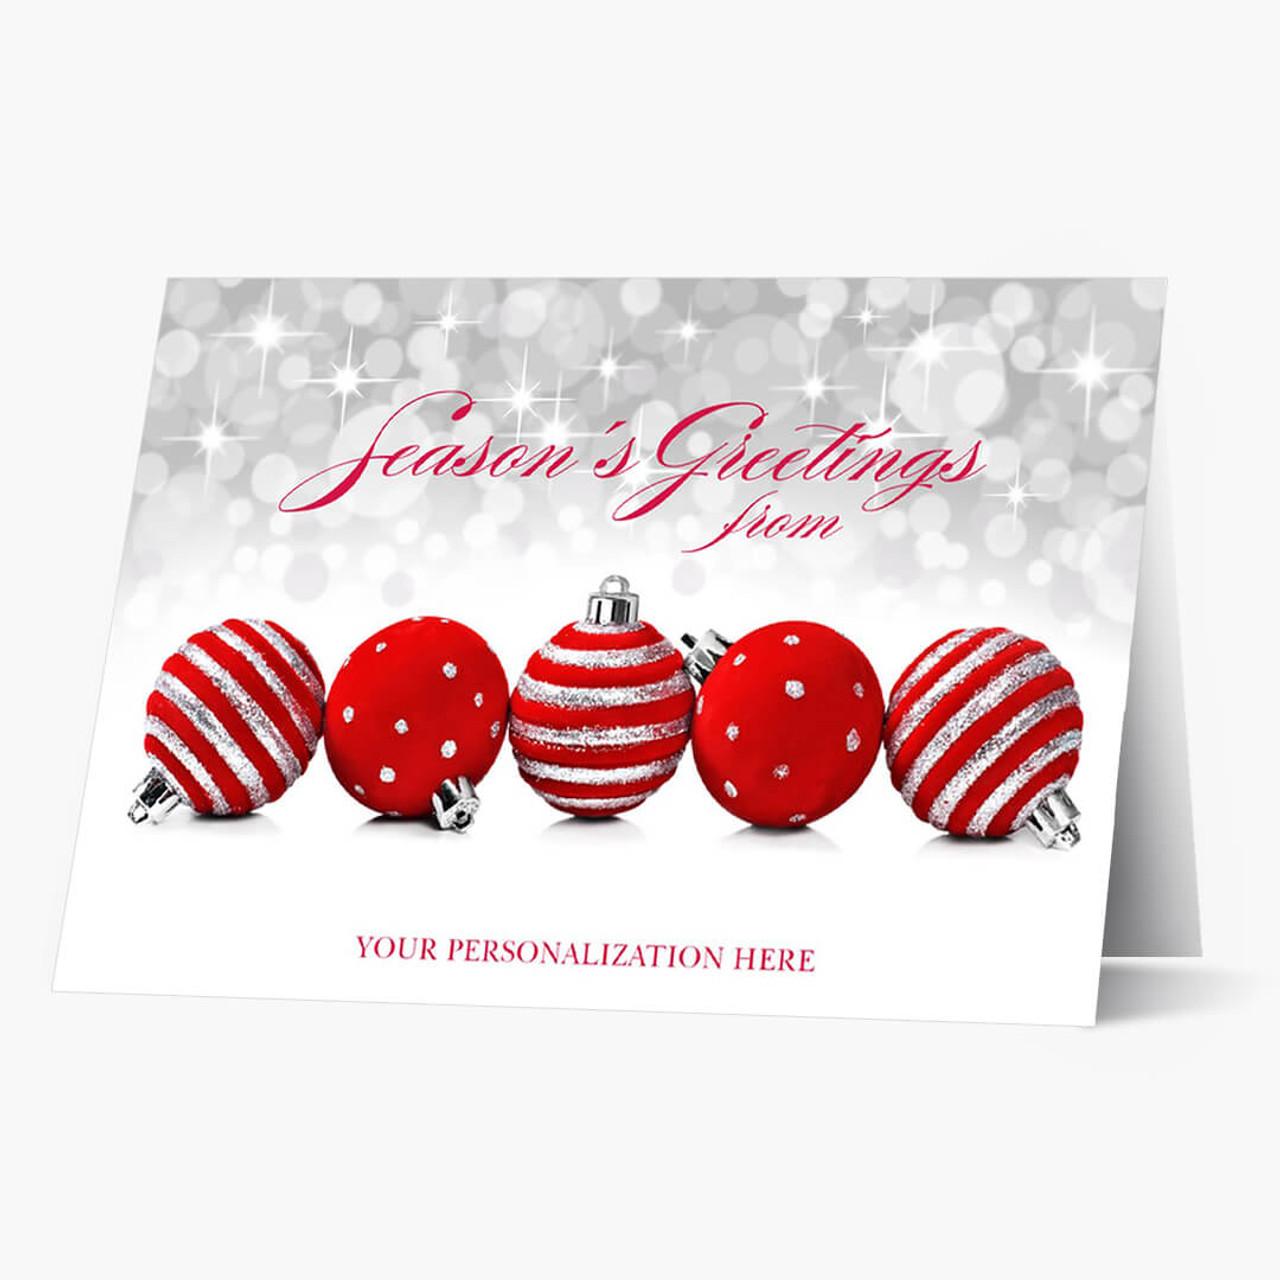 Sparkling Season Christmas Card